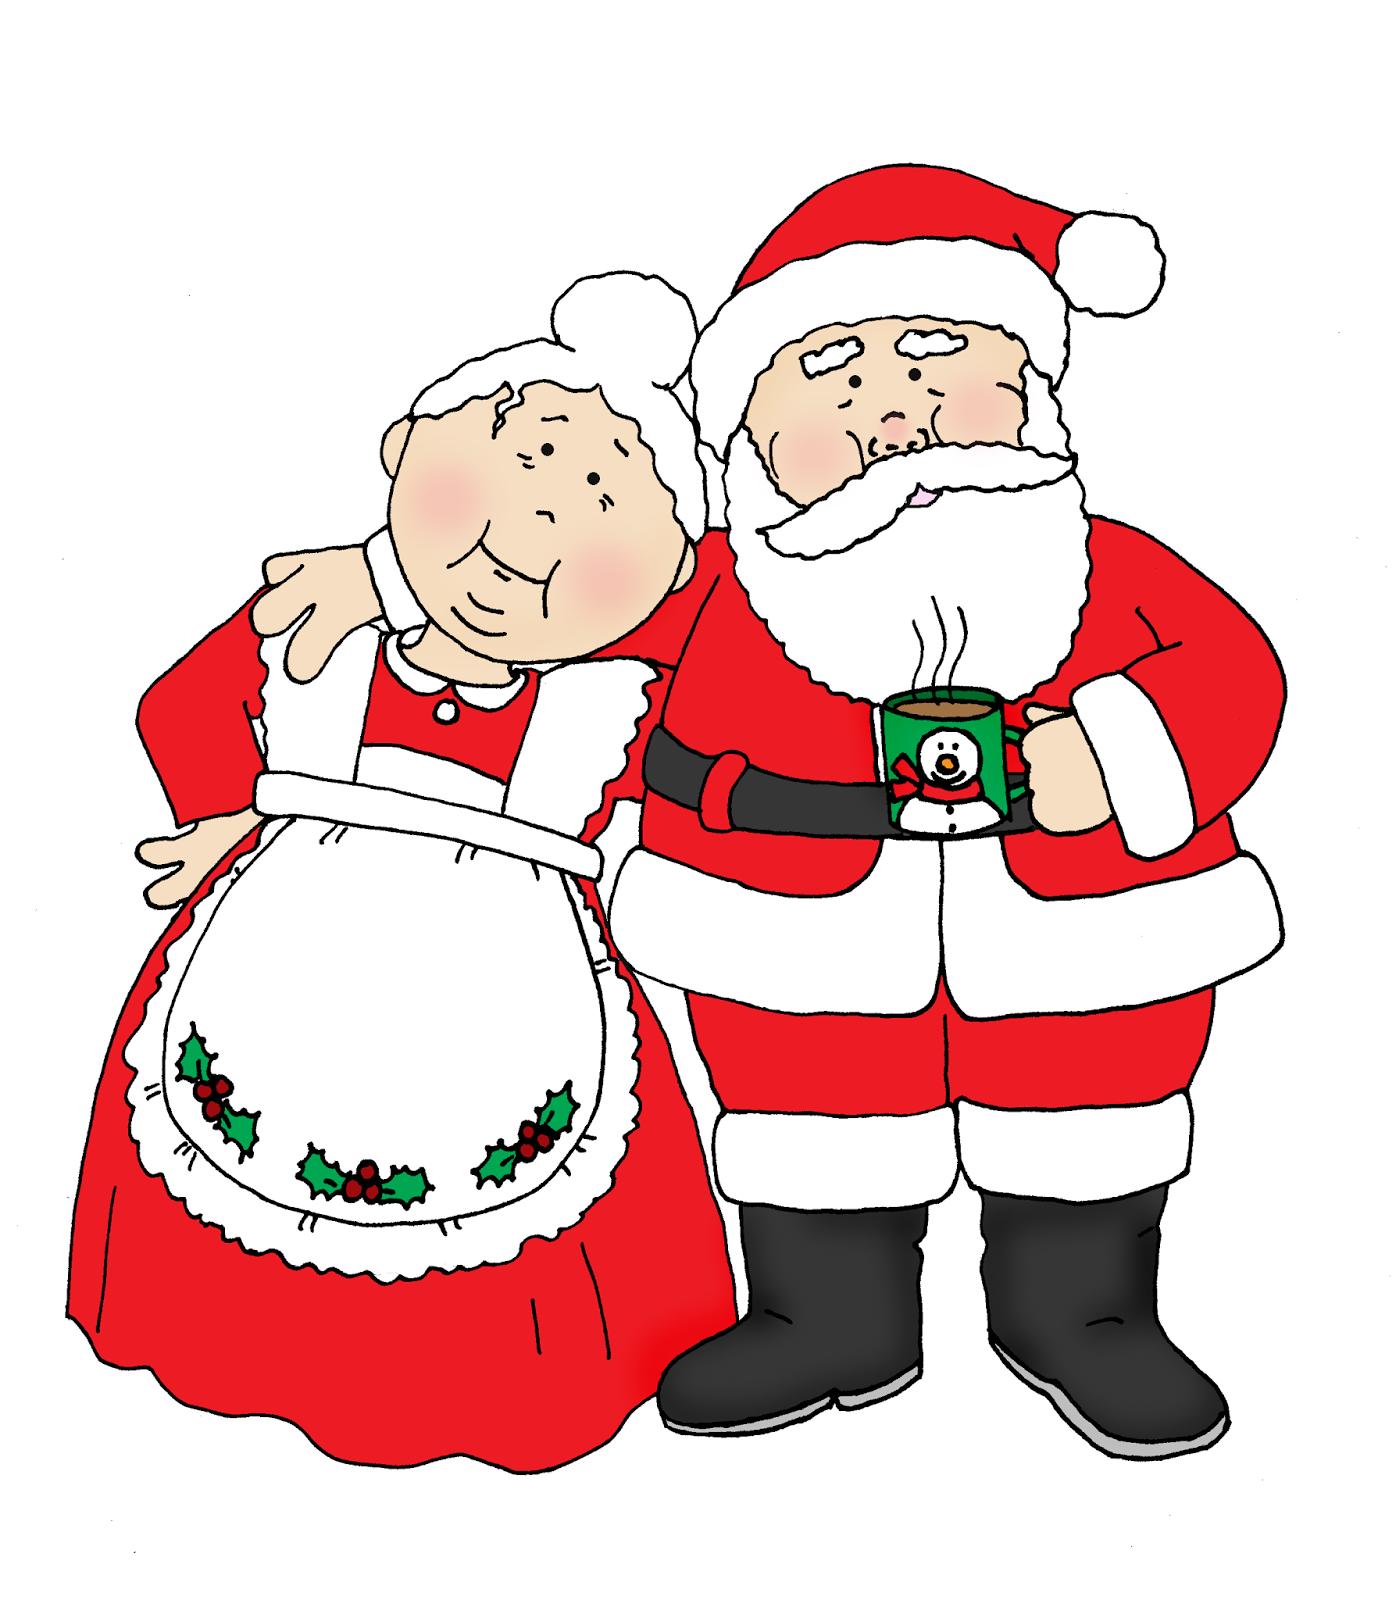 Mrs santa clipart image transparent stock Santa And Mrs Claus PNG Transparent Santa And Mrs Claus.PNG ... image transparent stock